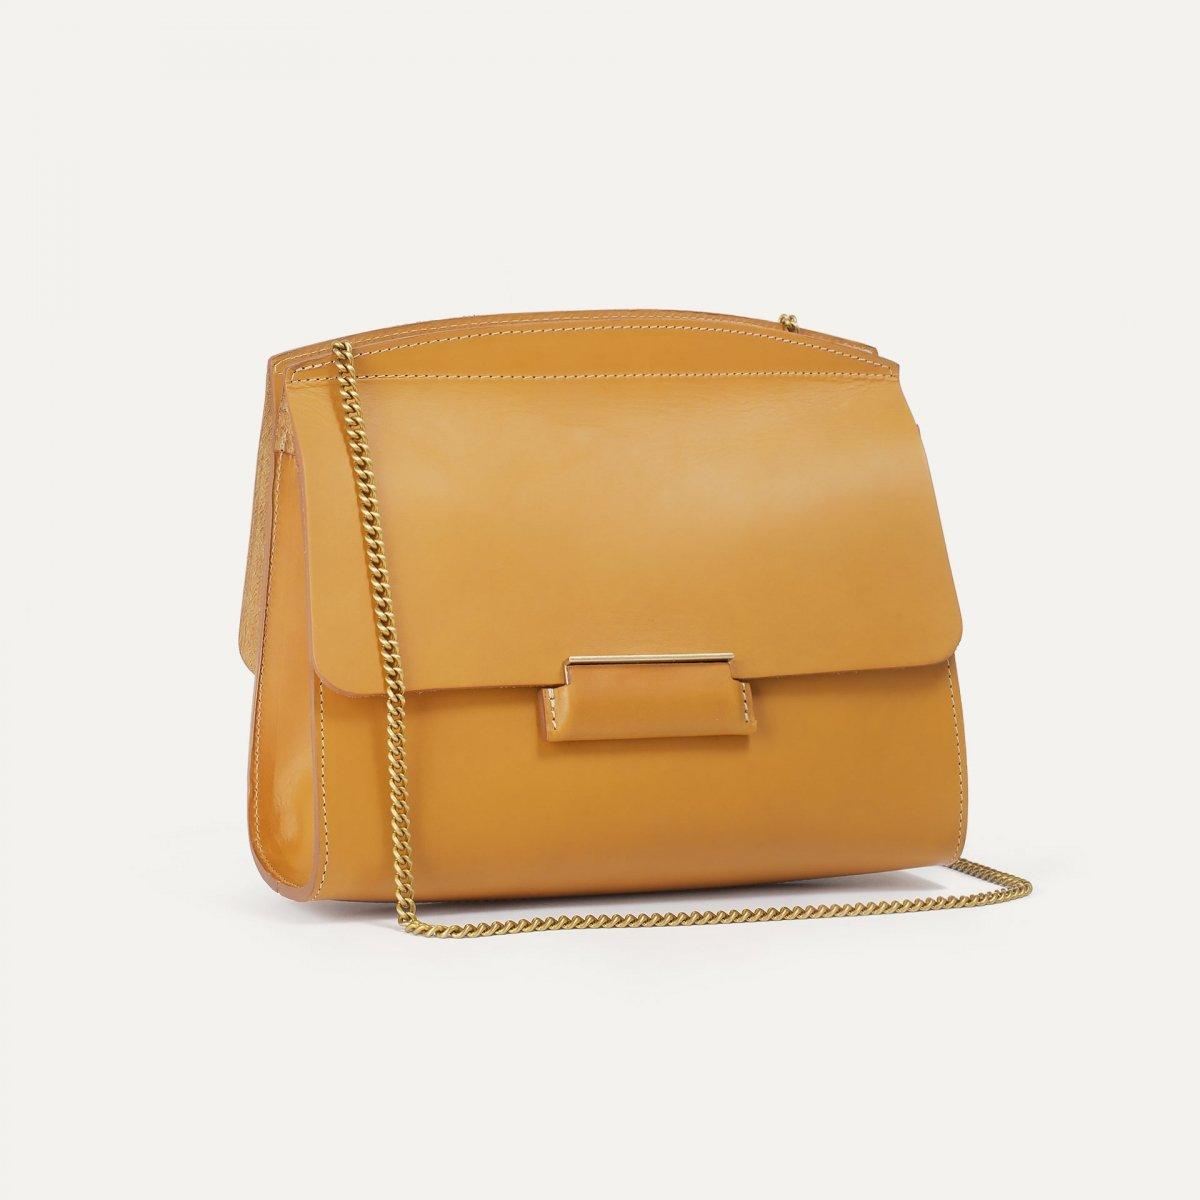 Origami S clutch bag - Honey (image n°3)